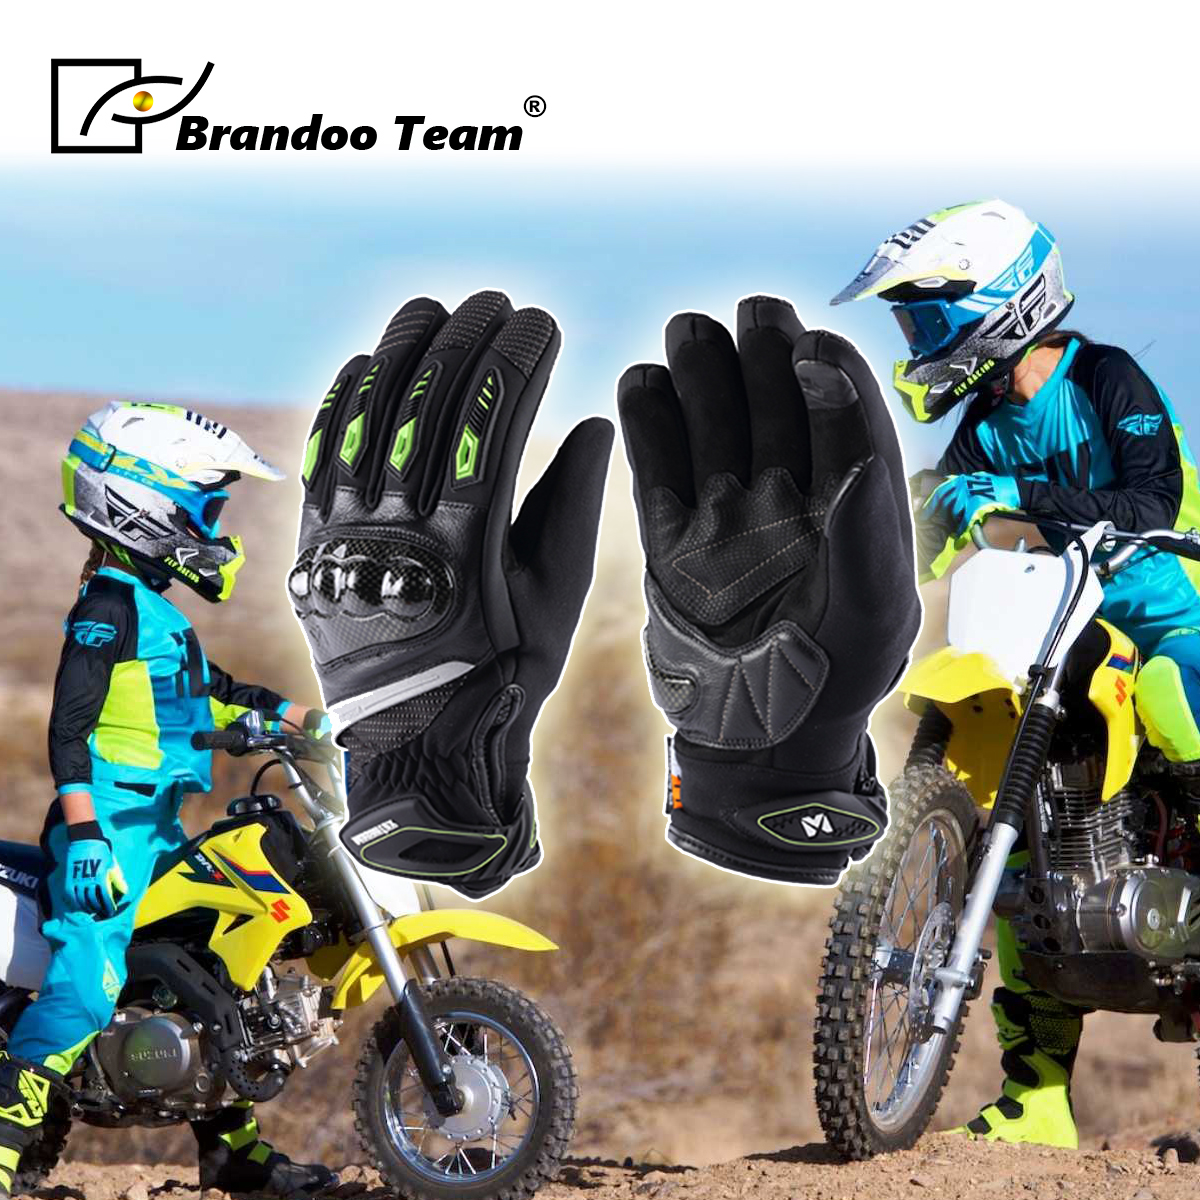 Kids Gloves Warm Full Finger Motorcycle Gloves Child Moto Luvas Motocross Leather Motorbike Guantes Children Racing Moto Gloves